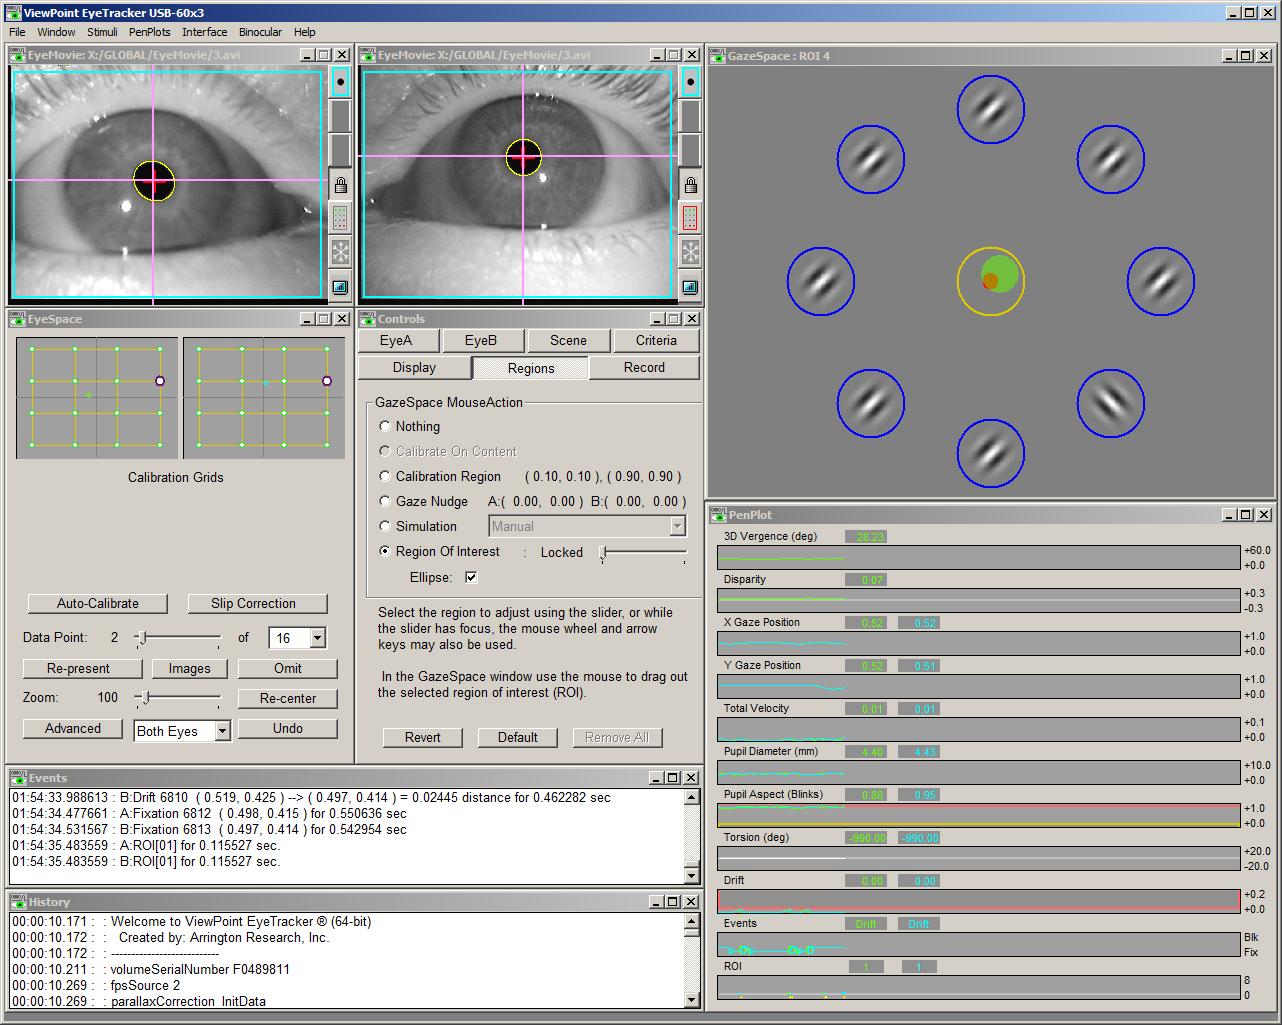 Arrington Research Eye Tracker PC user interface